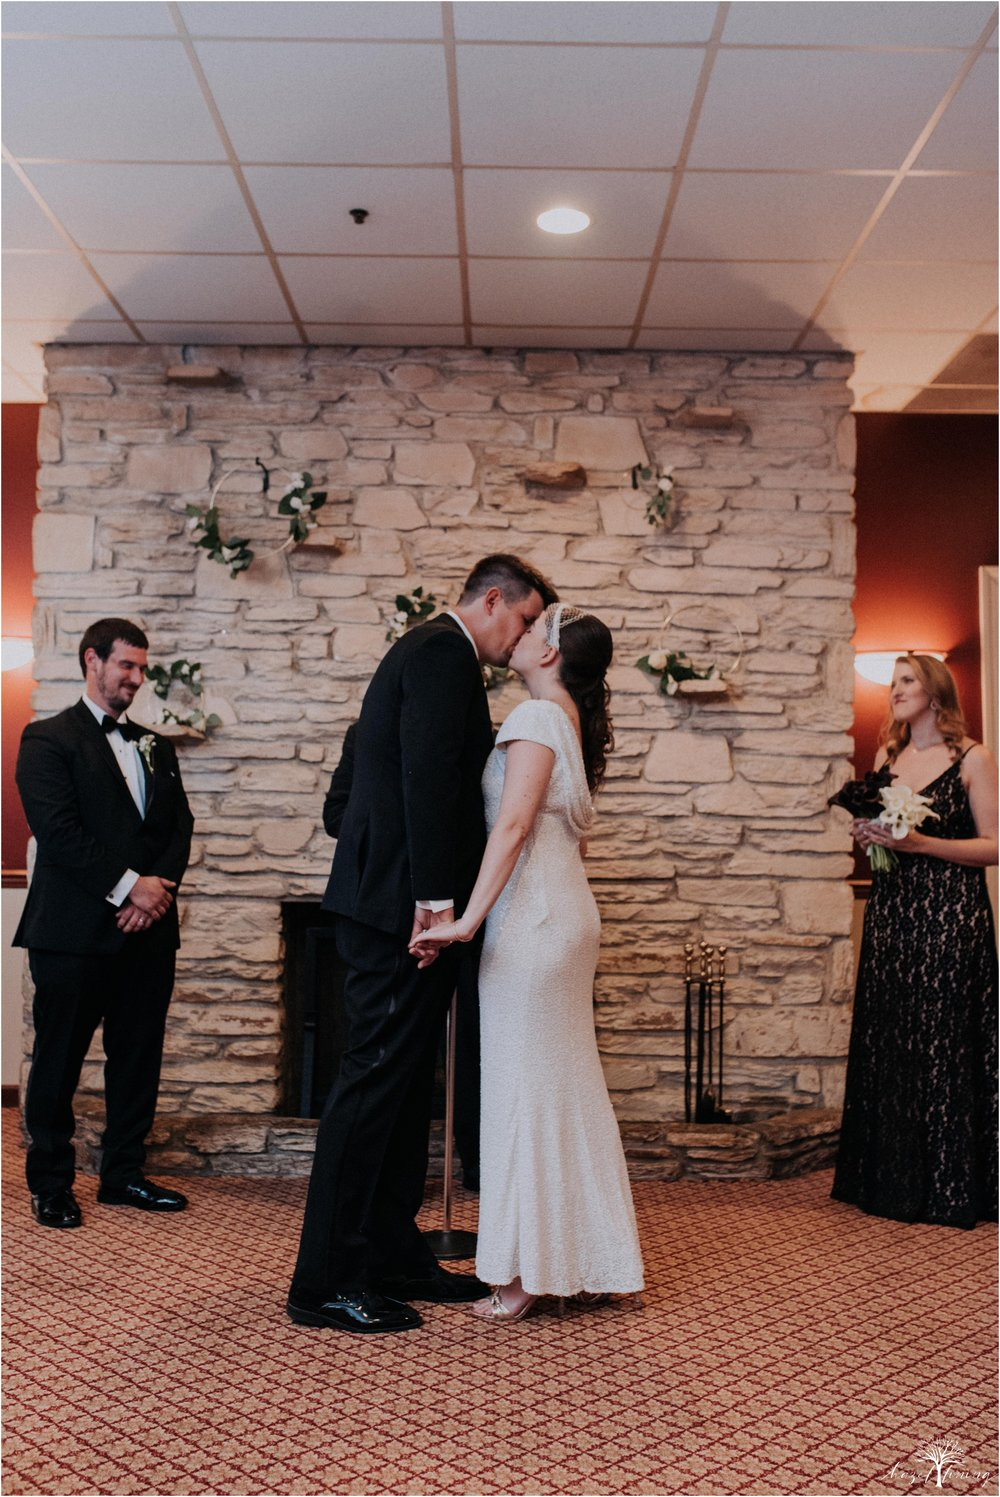 elizabeth-doelp-andrew-foreback-middletown-country-club-summer-langhorne-pennsylvania-wedding-hazel-lining-travel-wedding-elopement-photography_0116.jpg